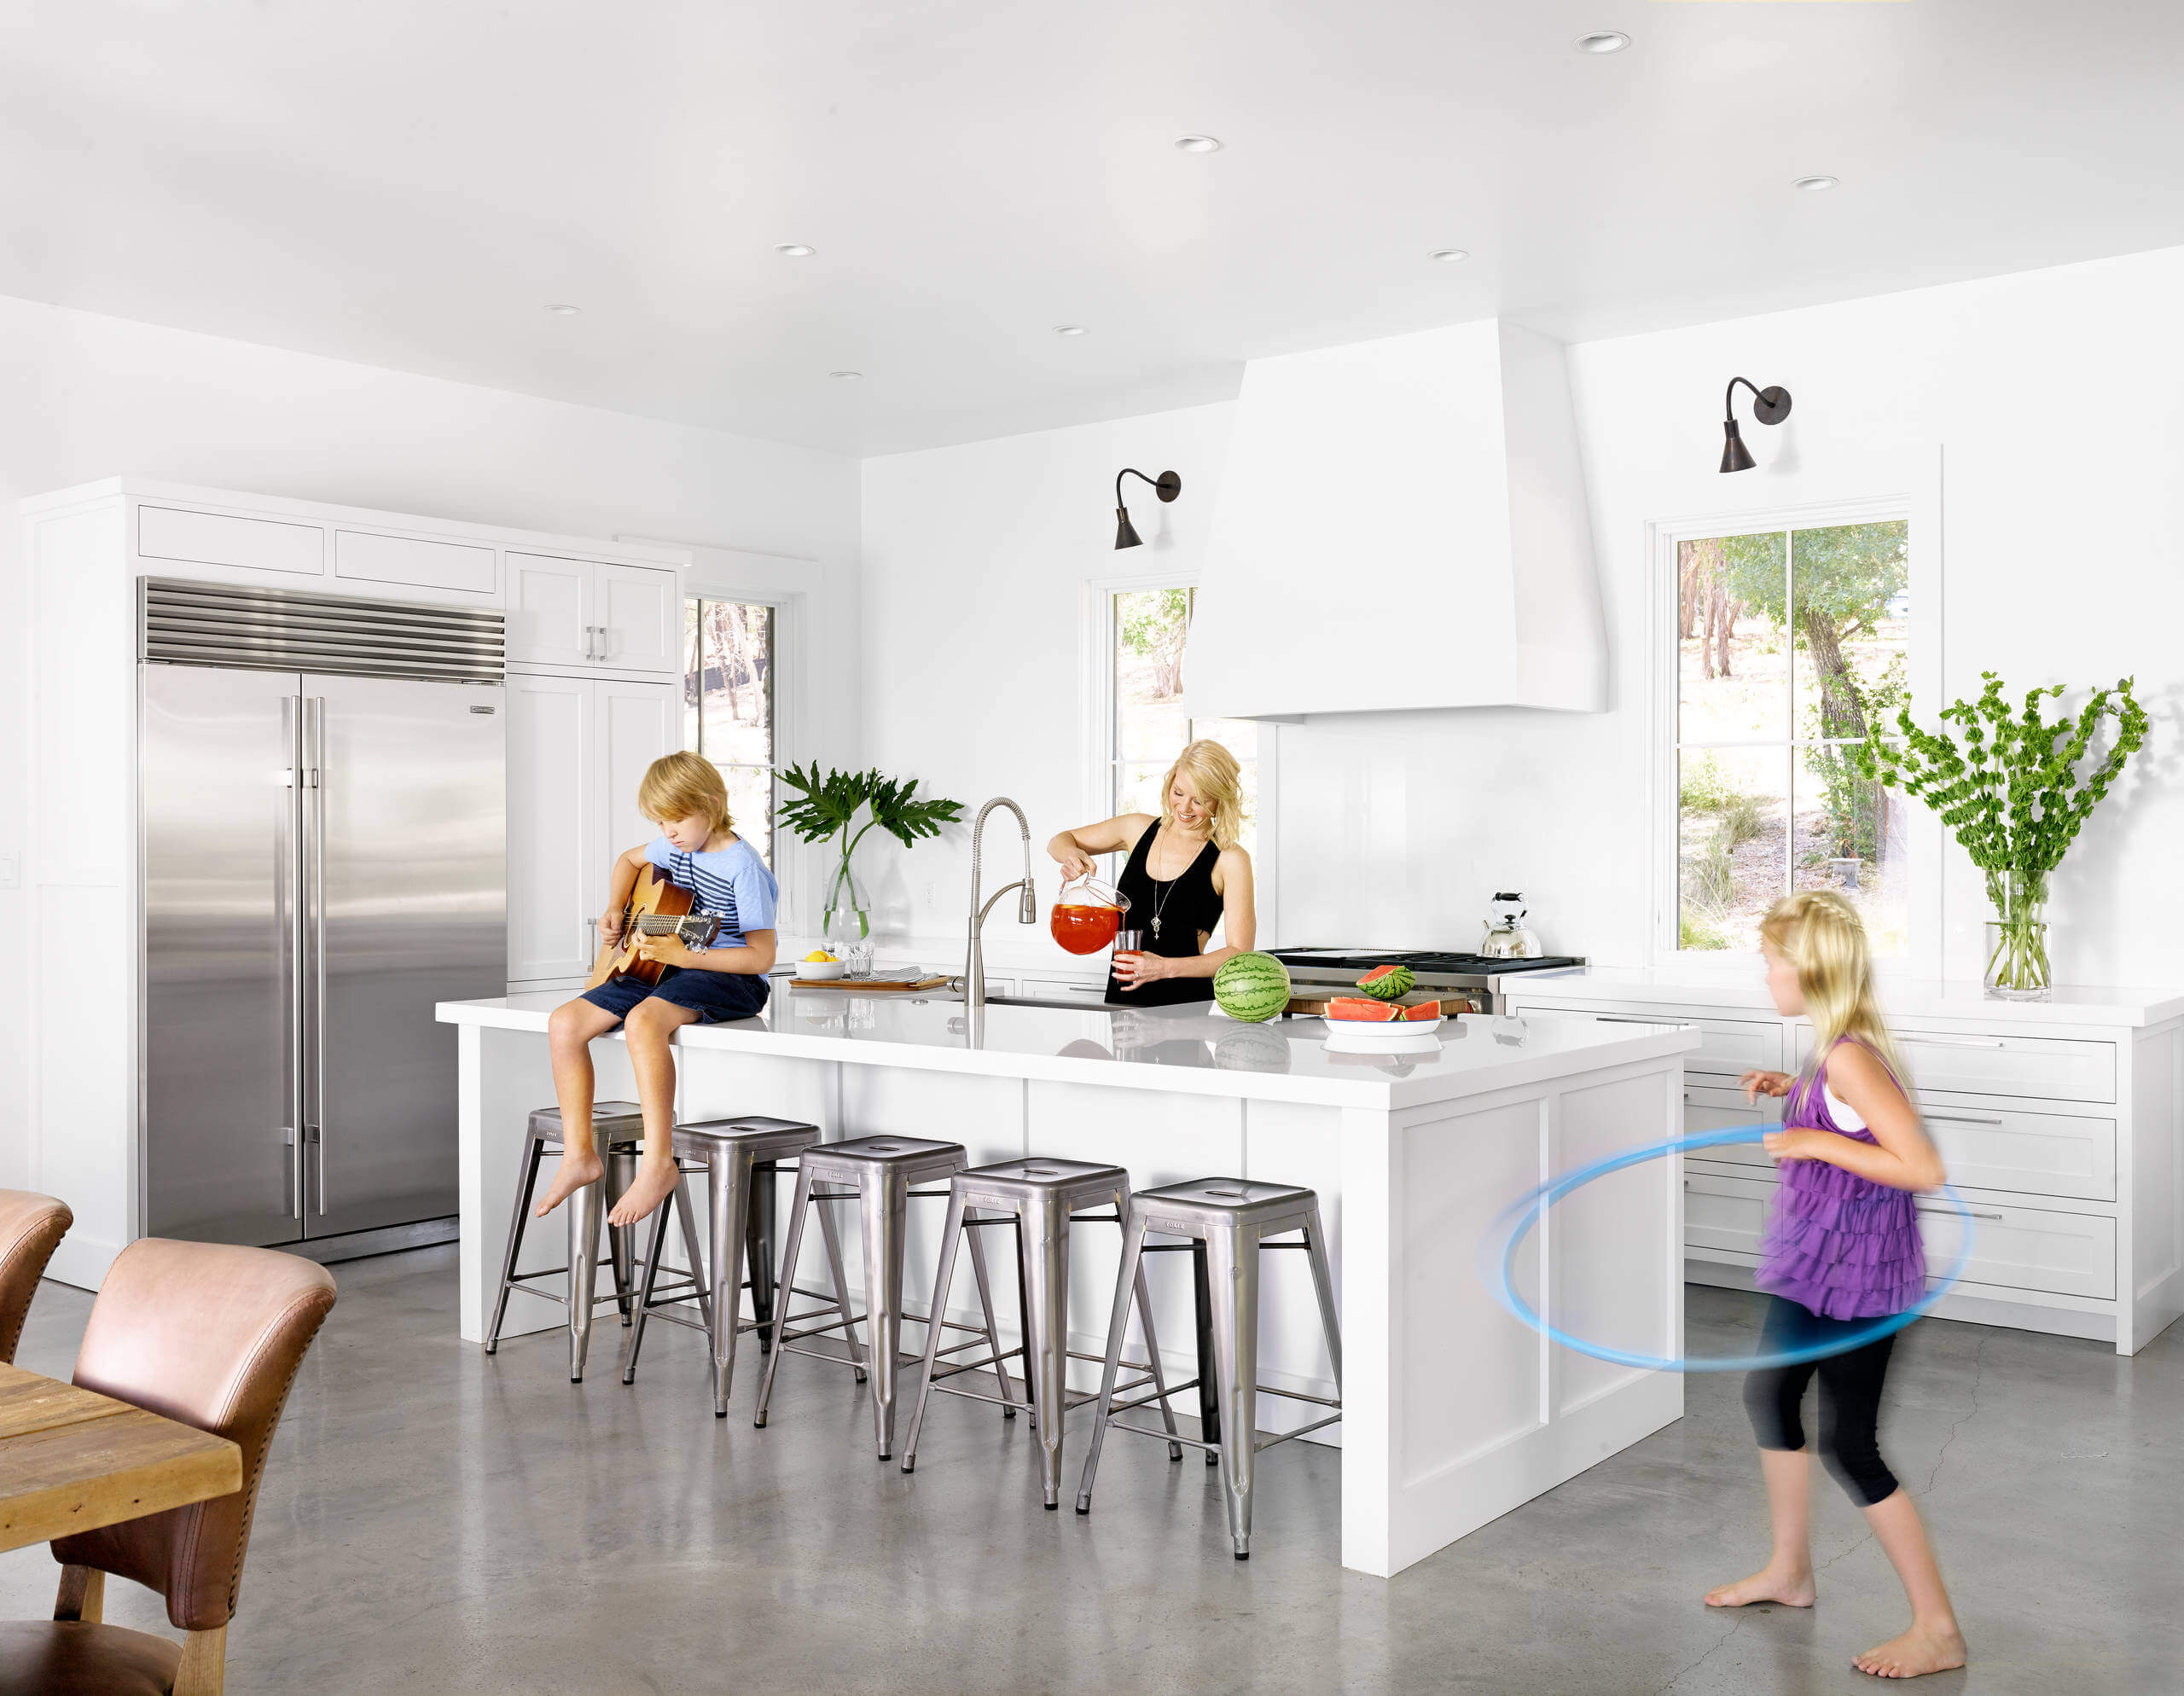 farmhouse-shiflet-group-architects-03